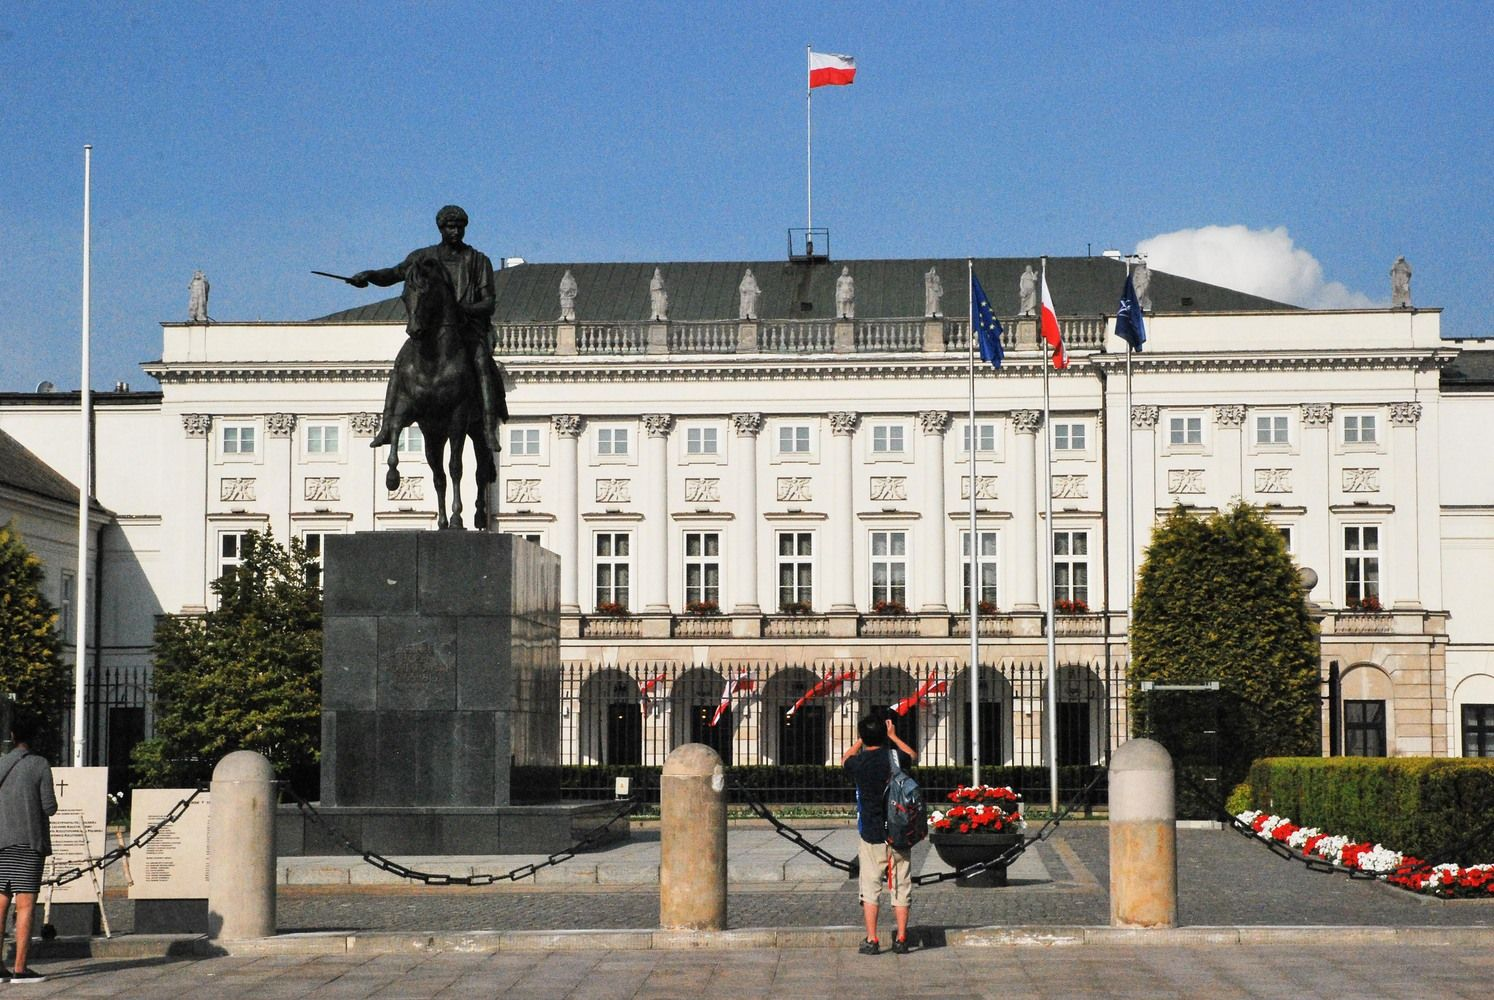 Tirpdomi santykių su Lenkija ledukai